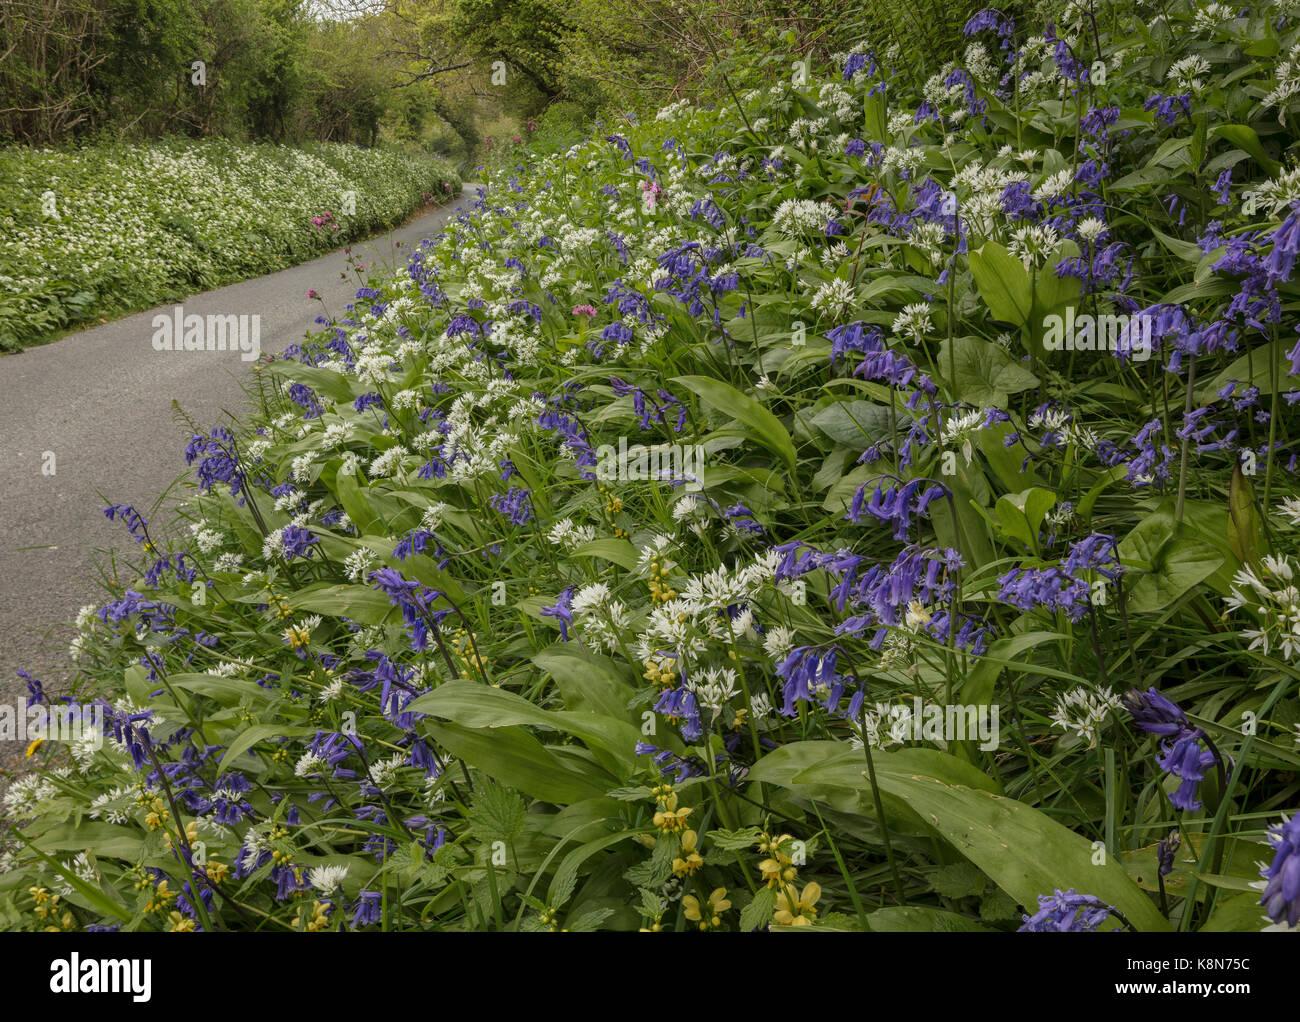 Beautiful flowery roadside verge in spring, with bluebells, wild garlic etc. near Powerstock, Dorset - Stock Image